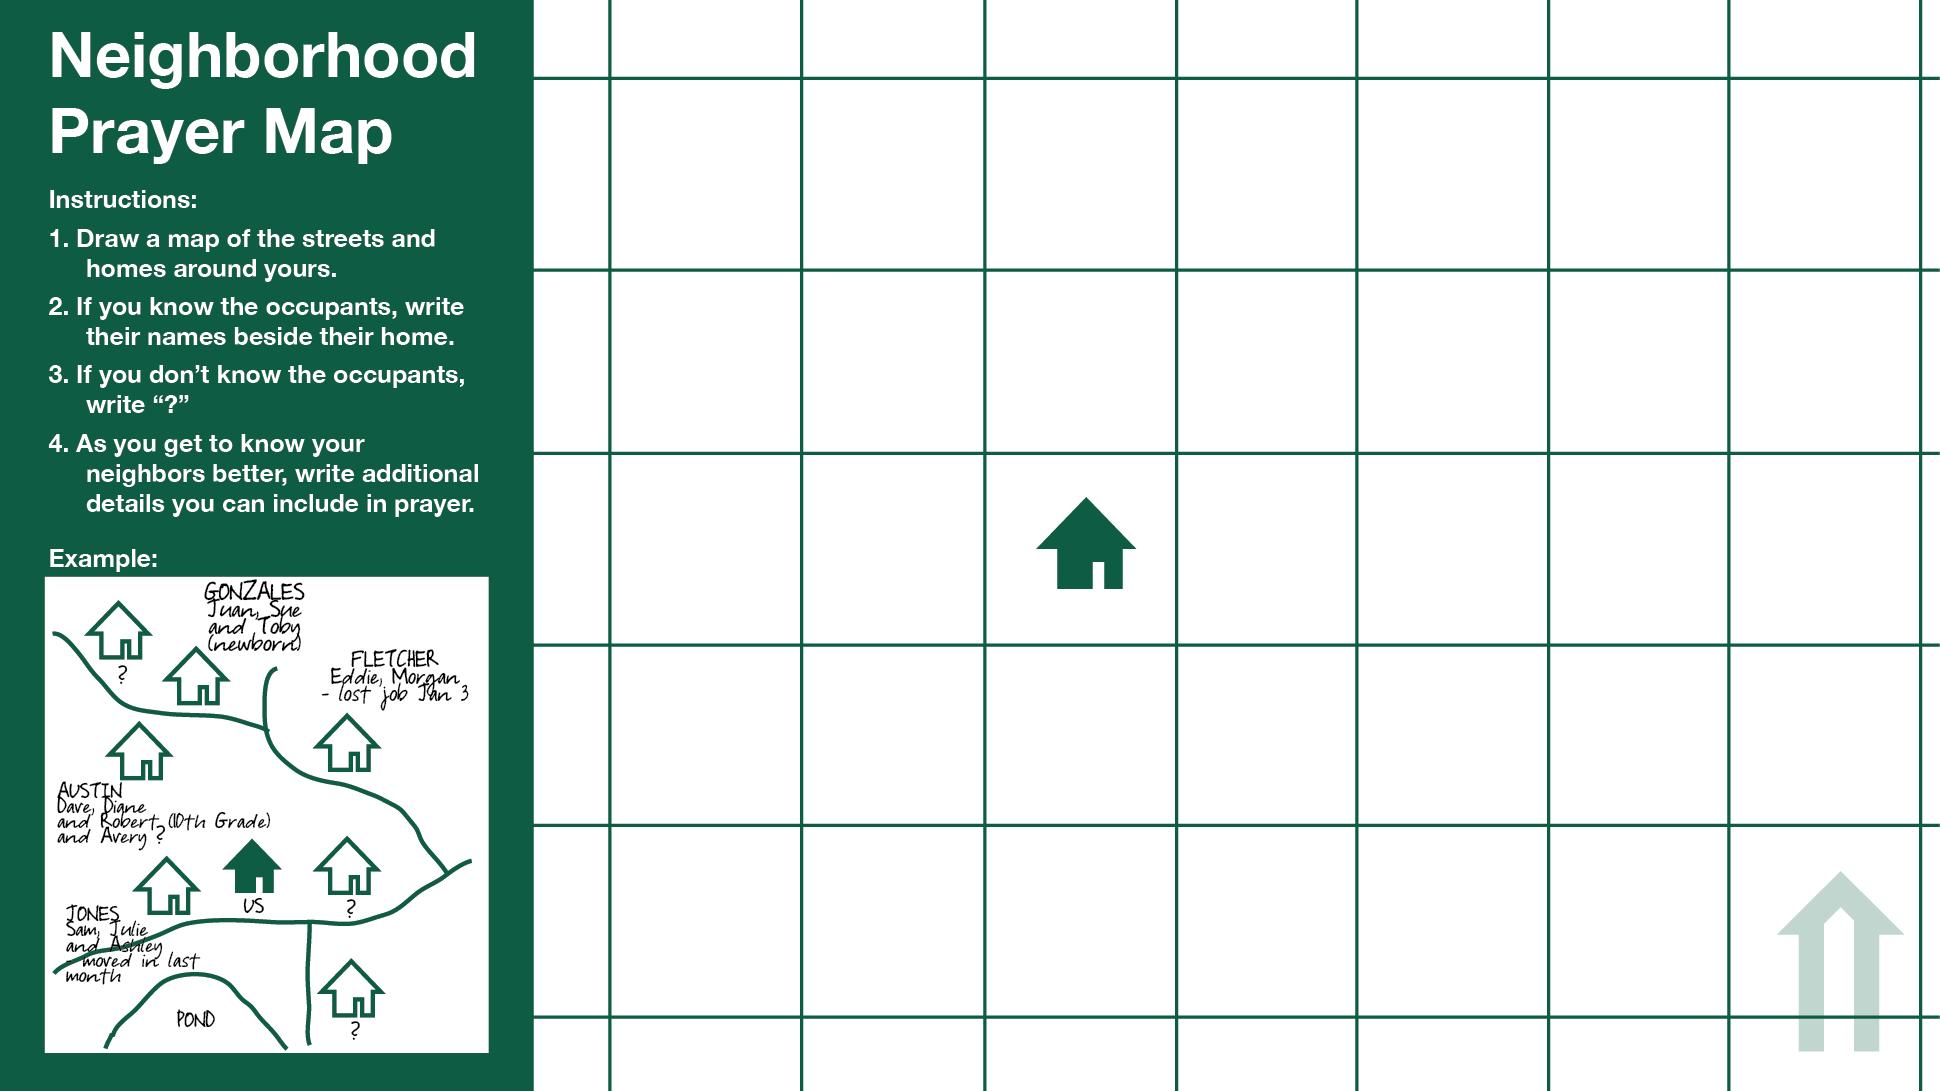 Prayer_Map_NeighborhoodMap (2).png